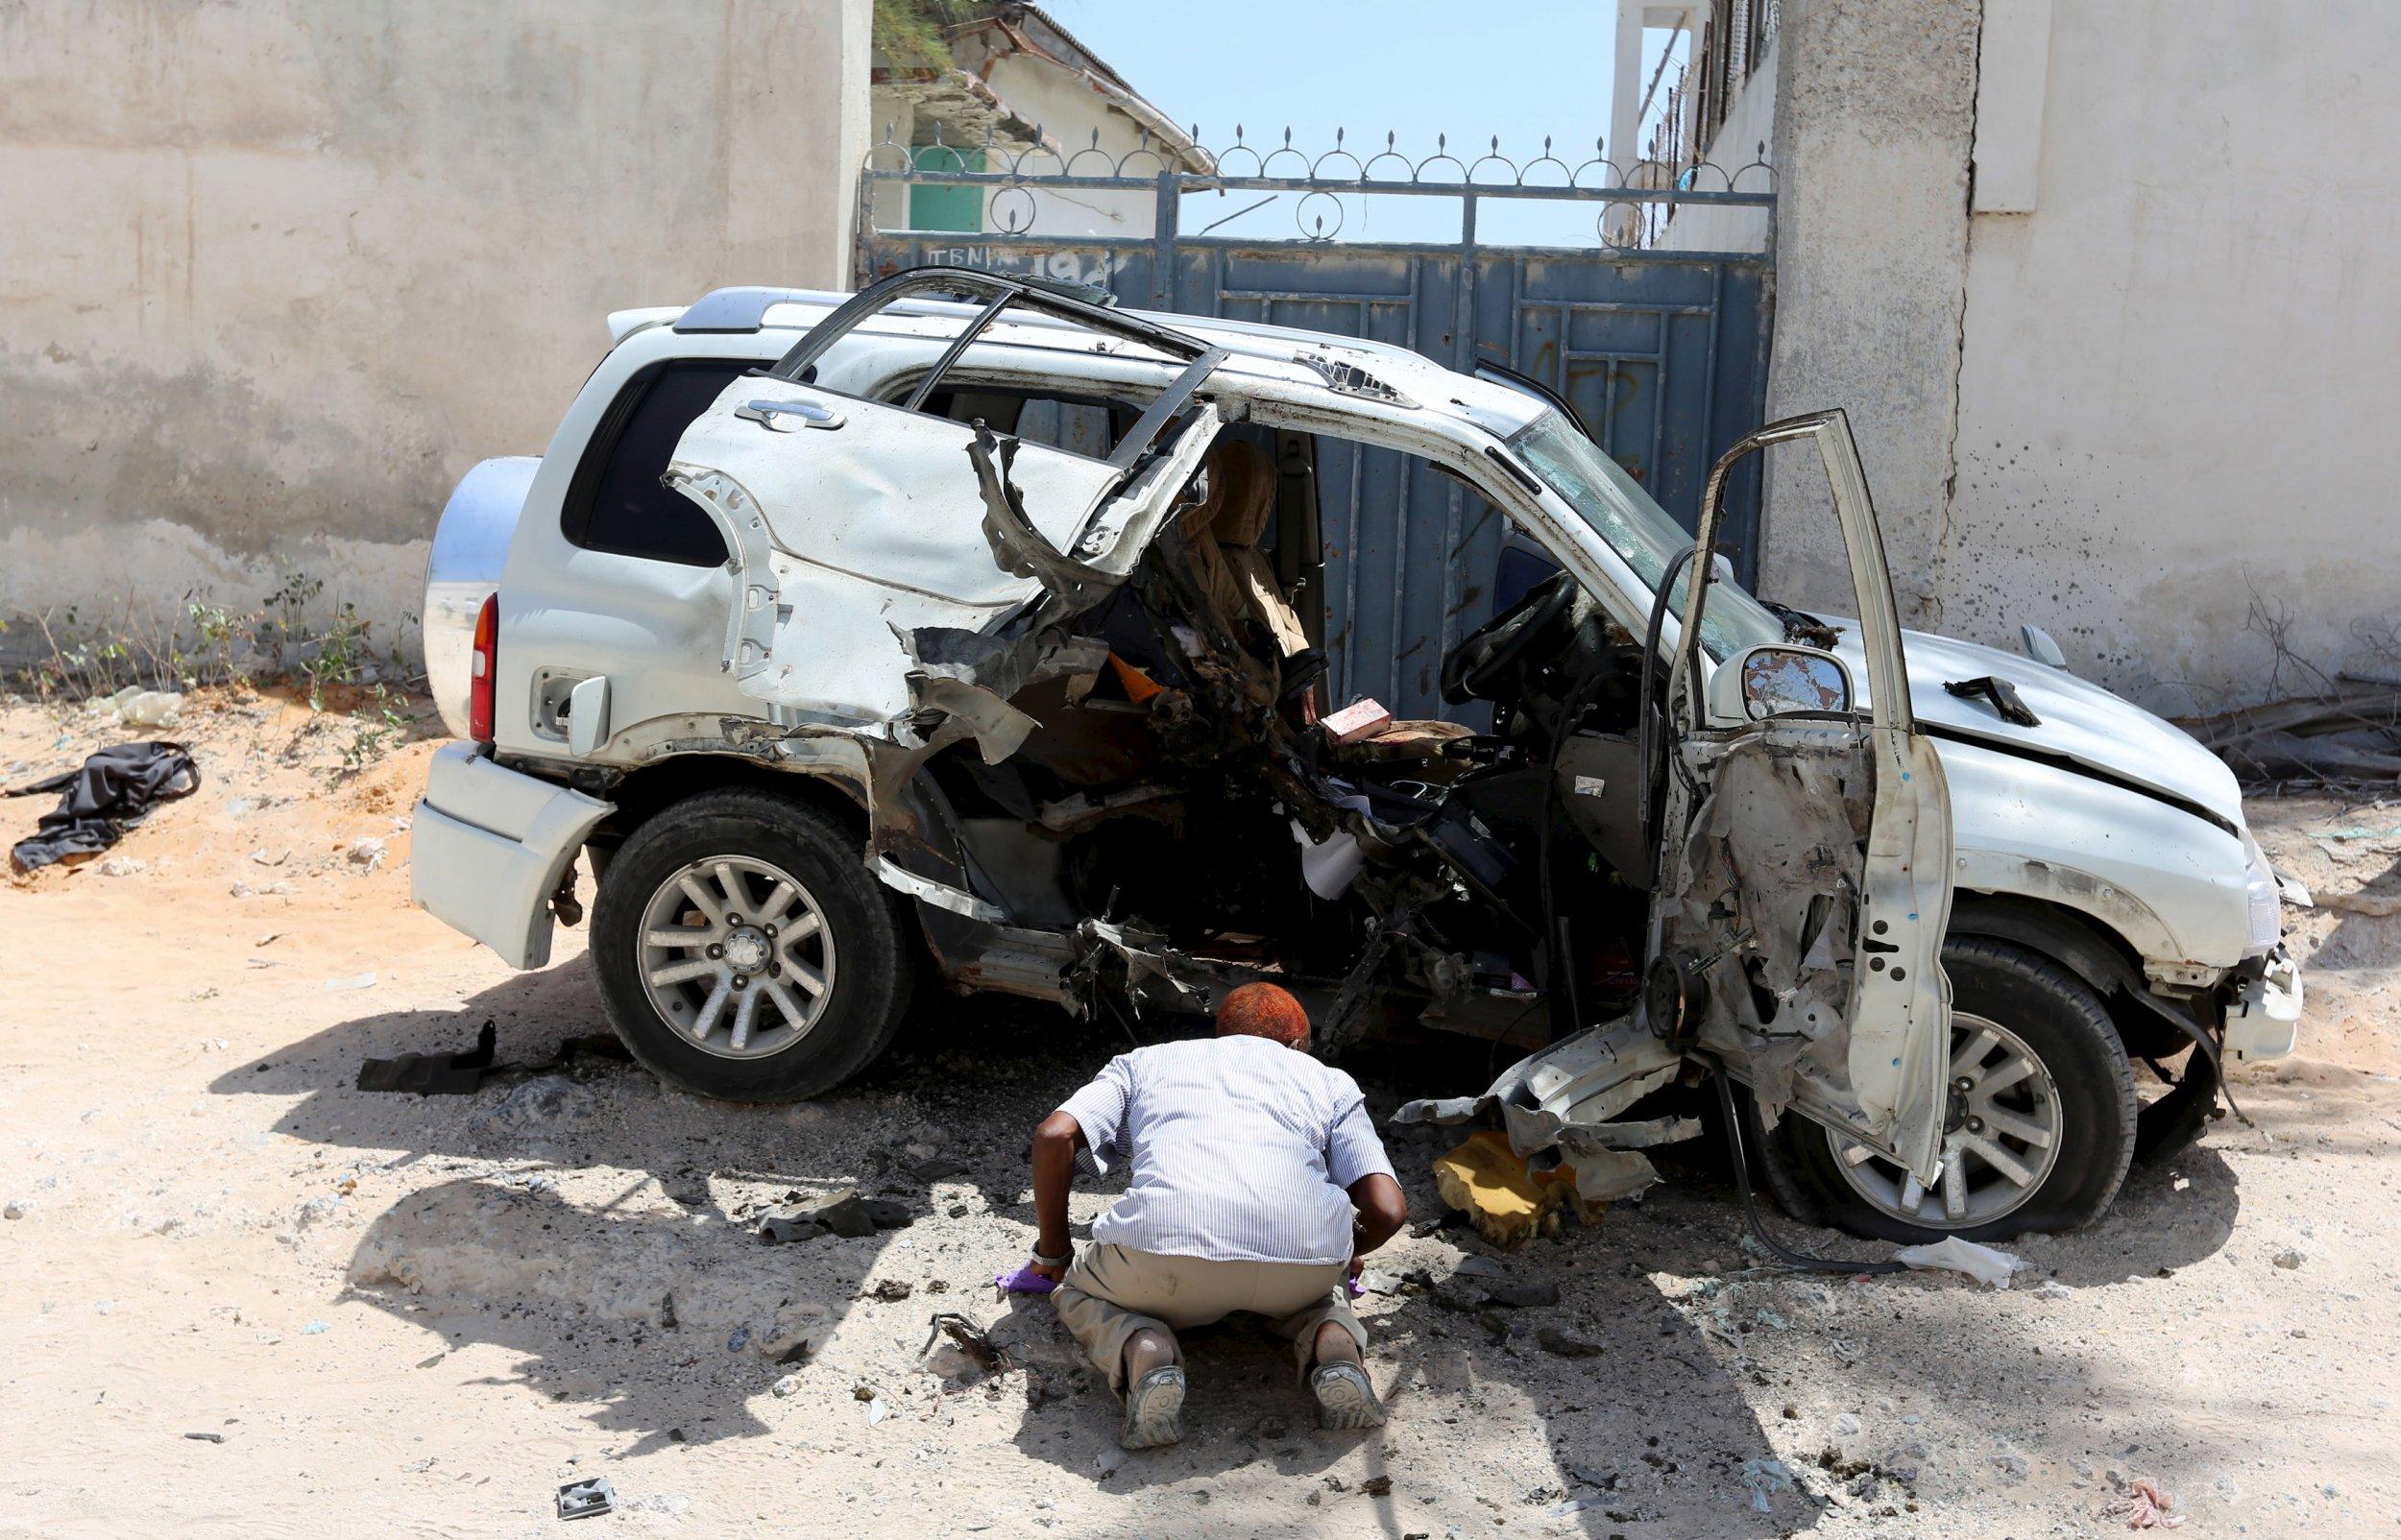 Al-Shabab claim responsibility for the car bomb that killed Muhayadin Mohamed.